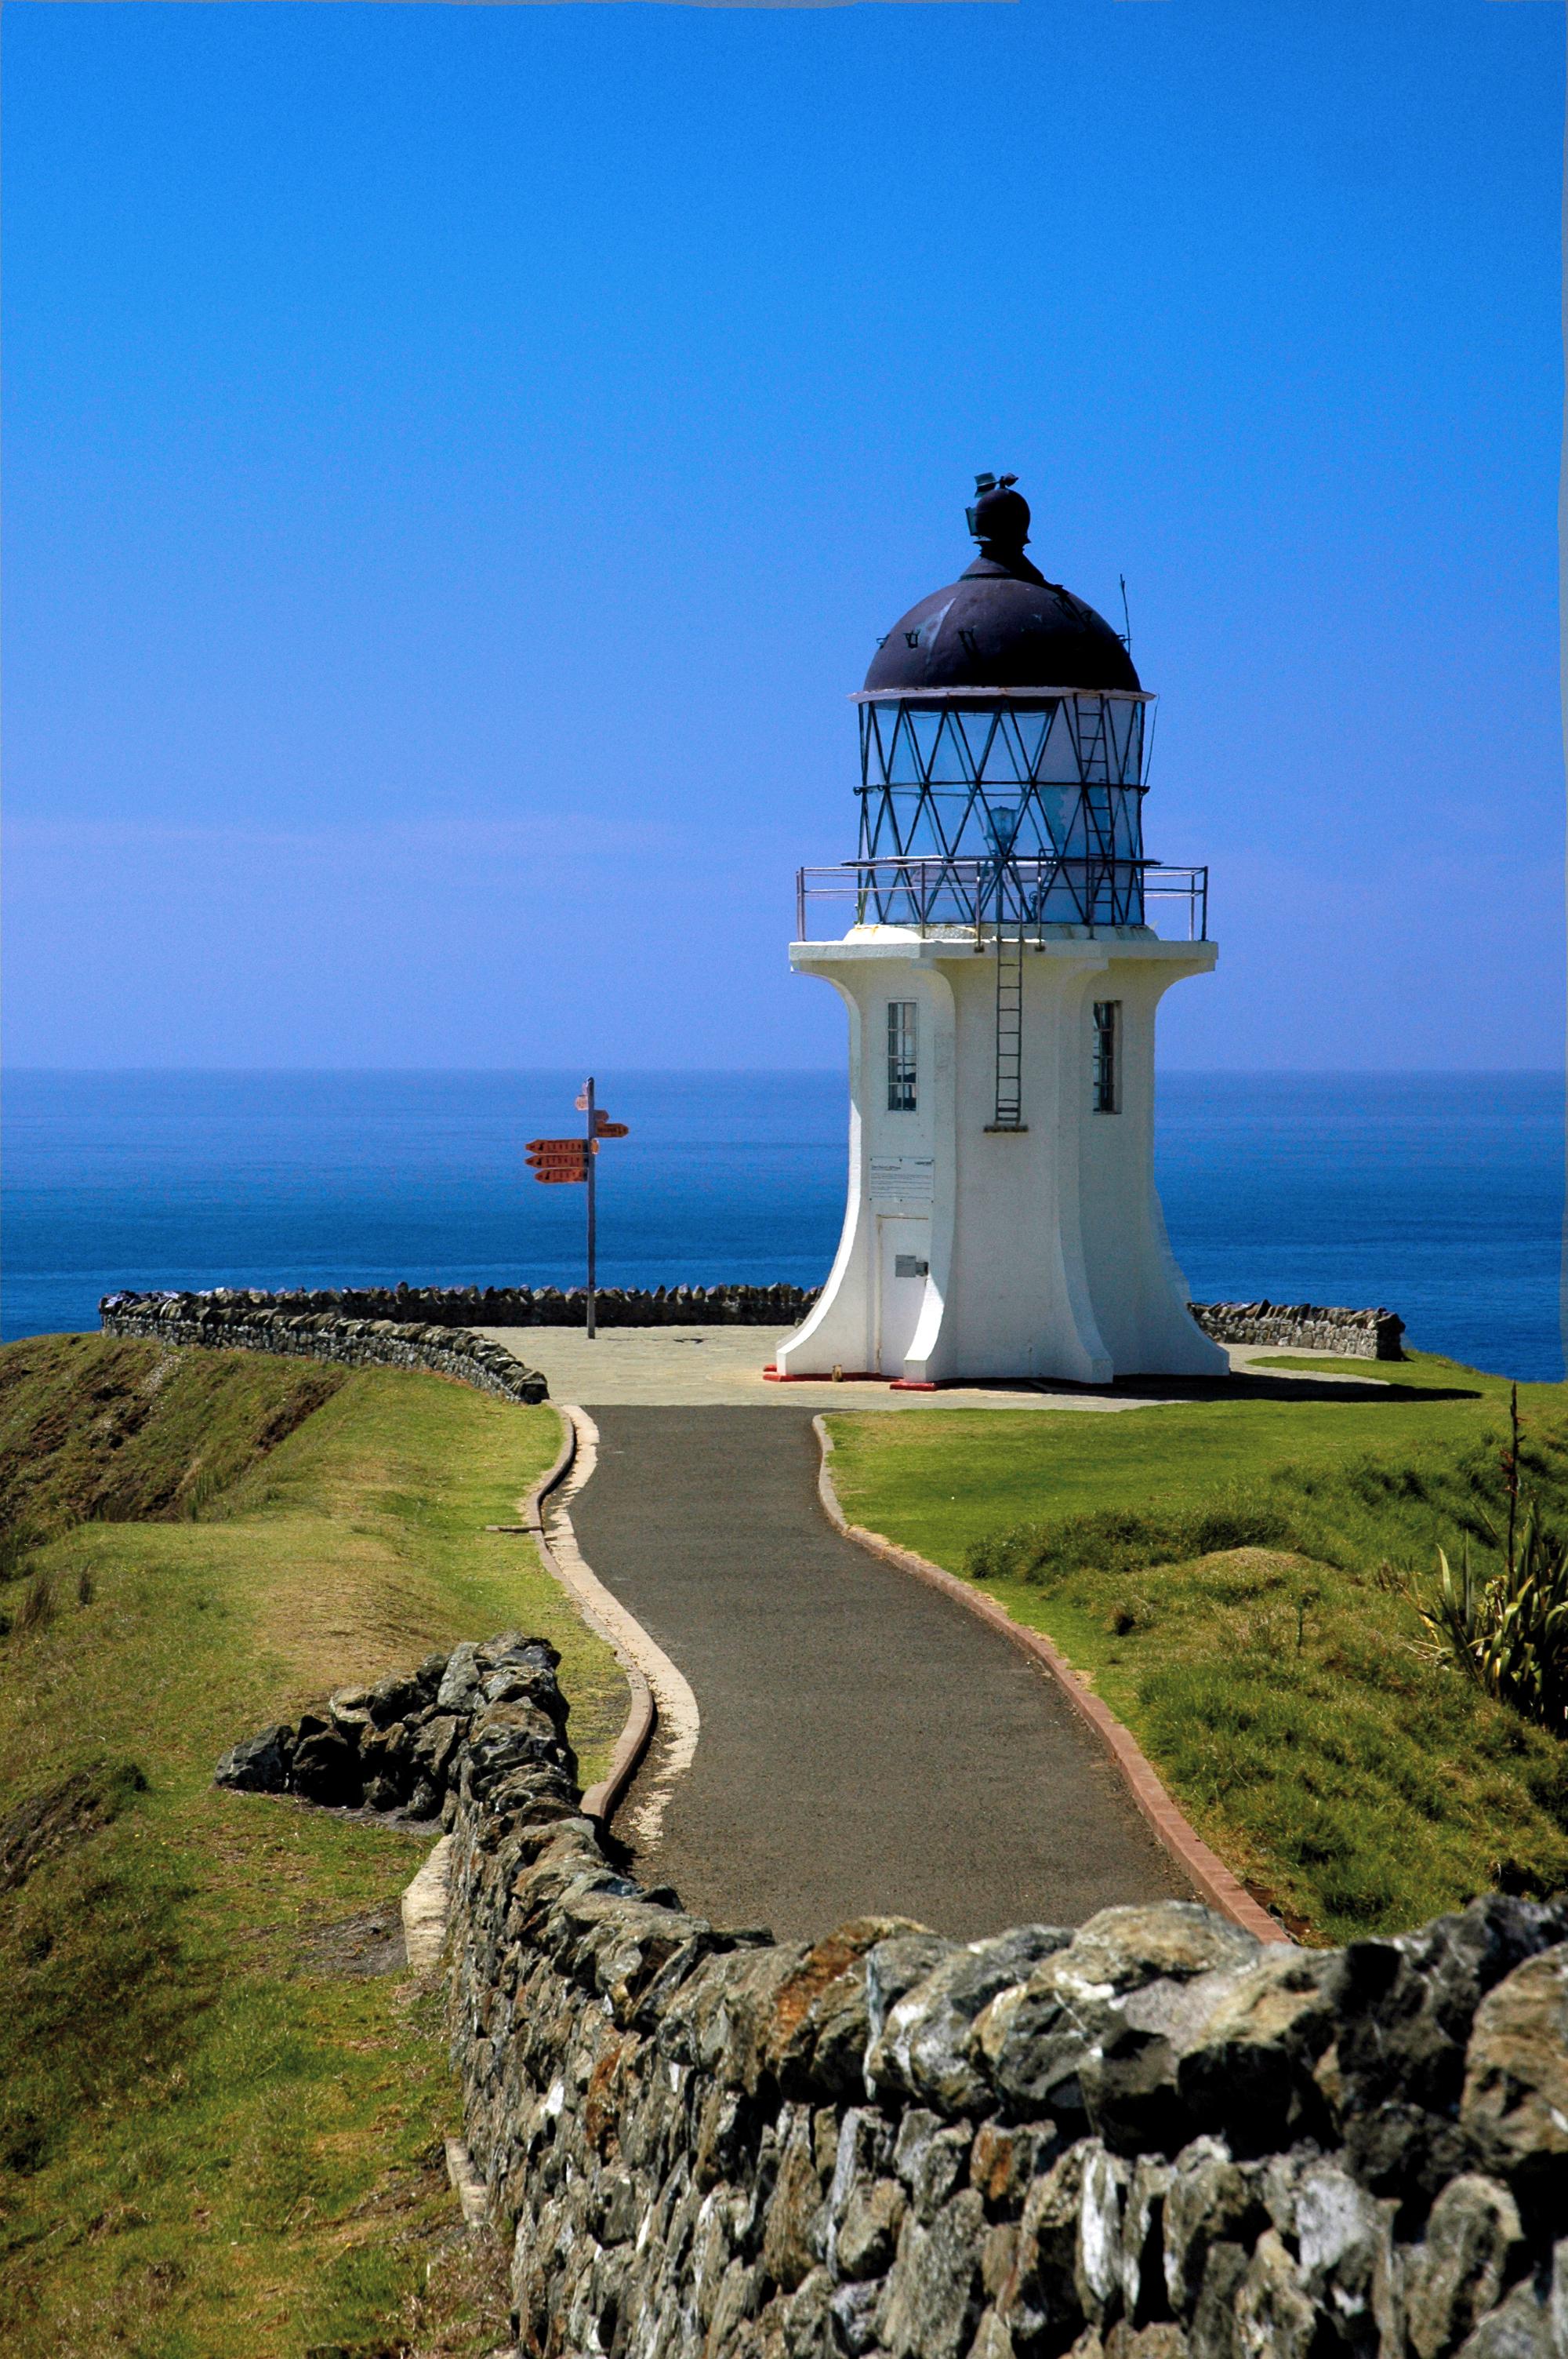 The Cape Reinga Lighthouse